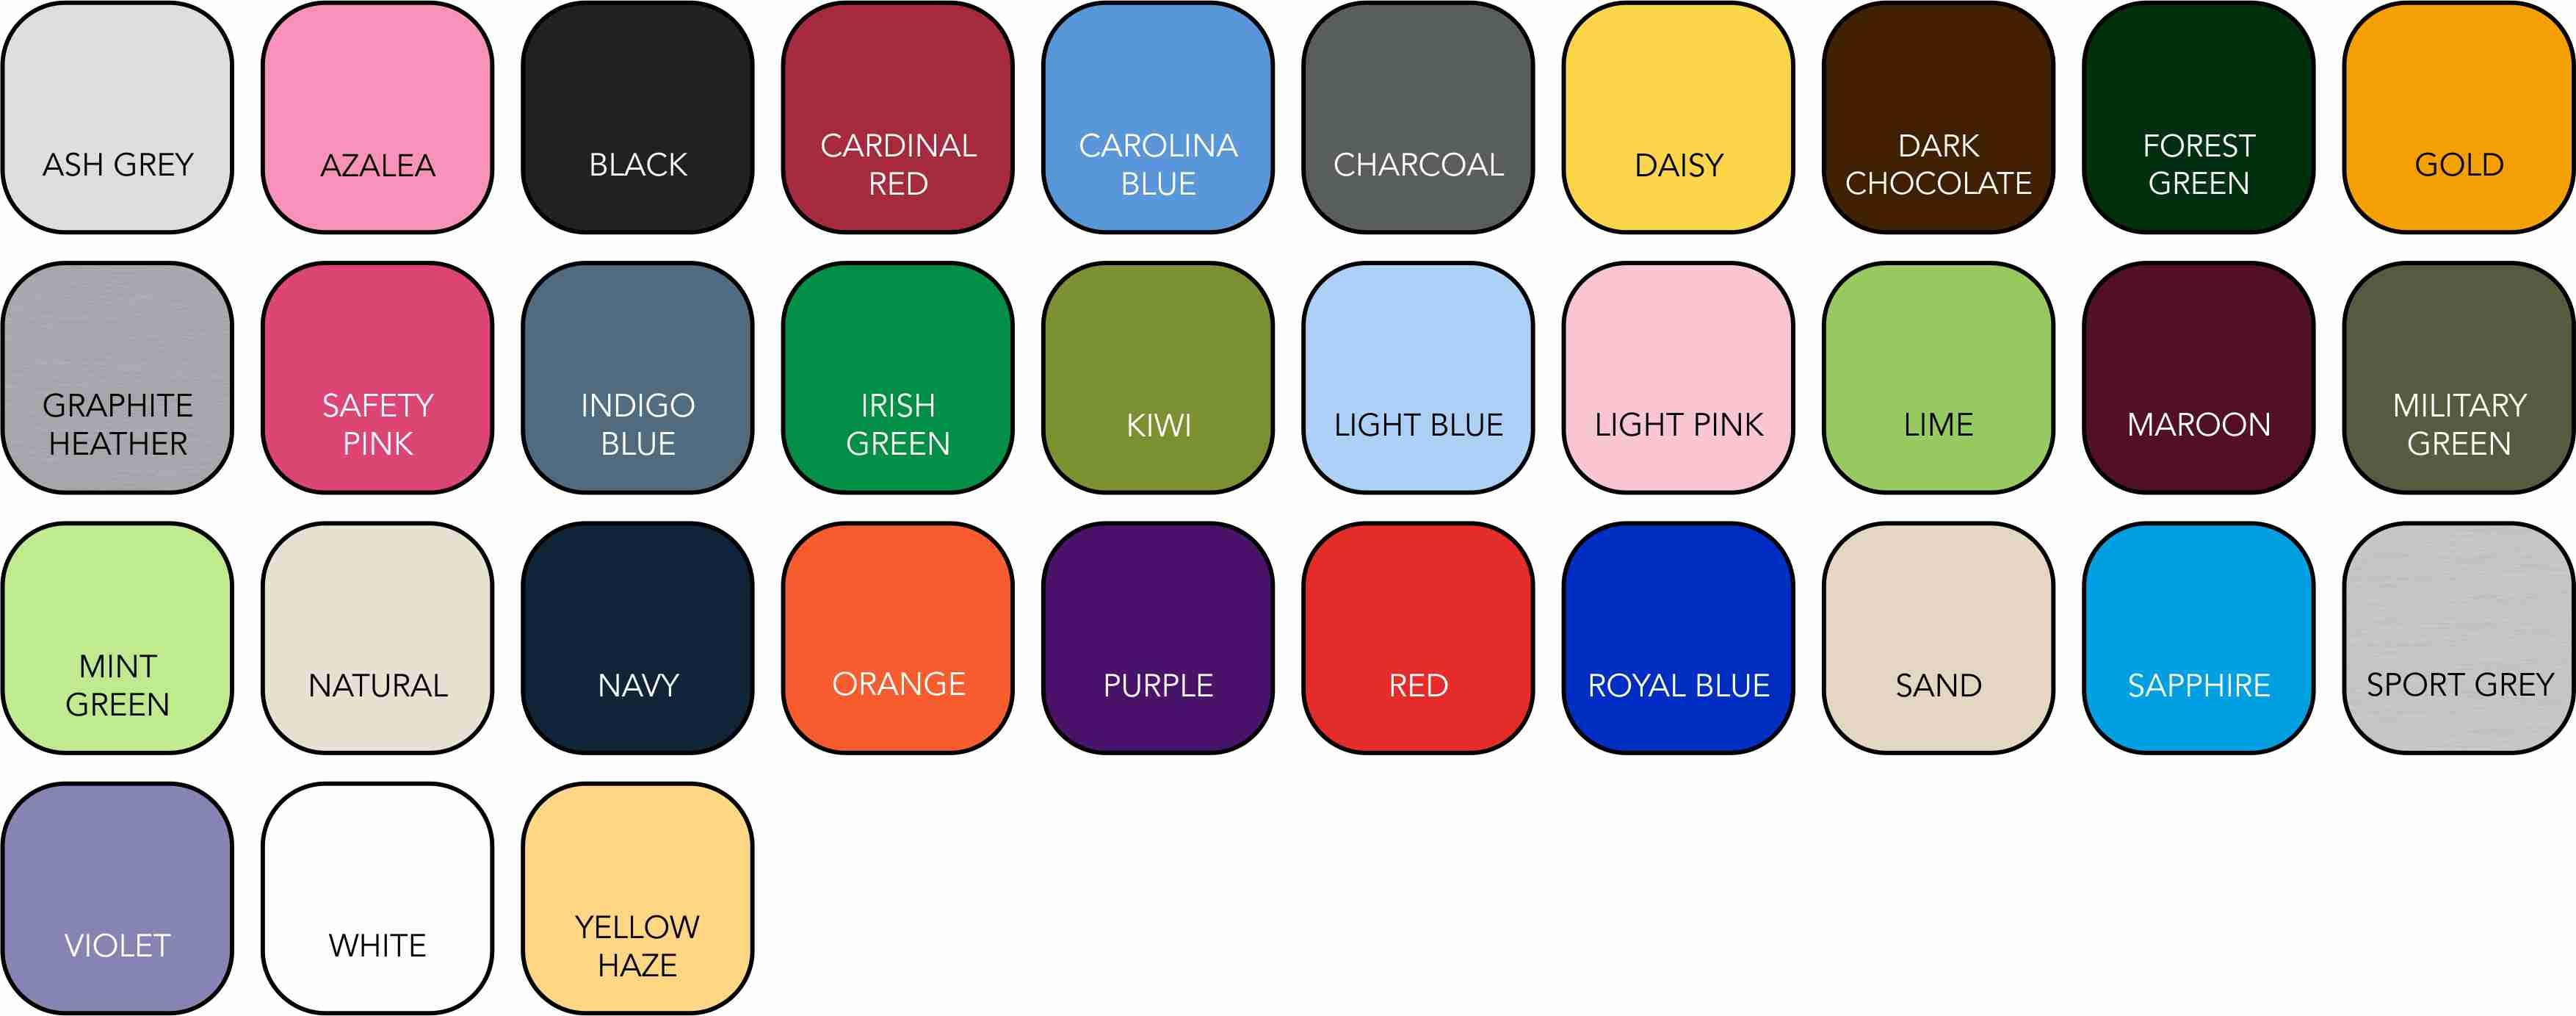 GD005 Children's Colour Range